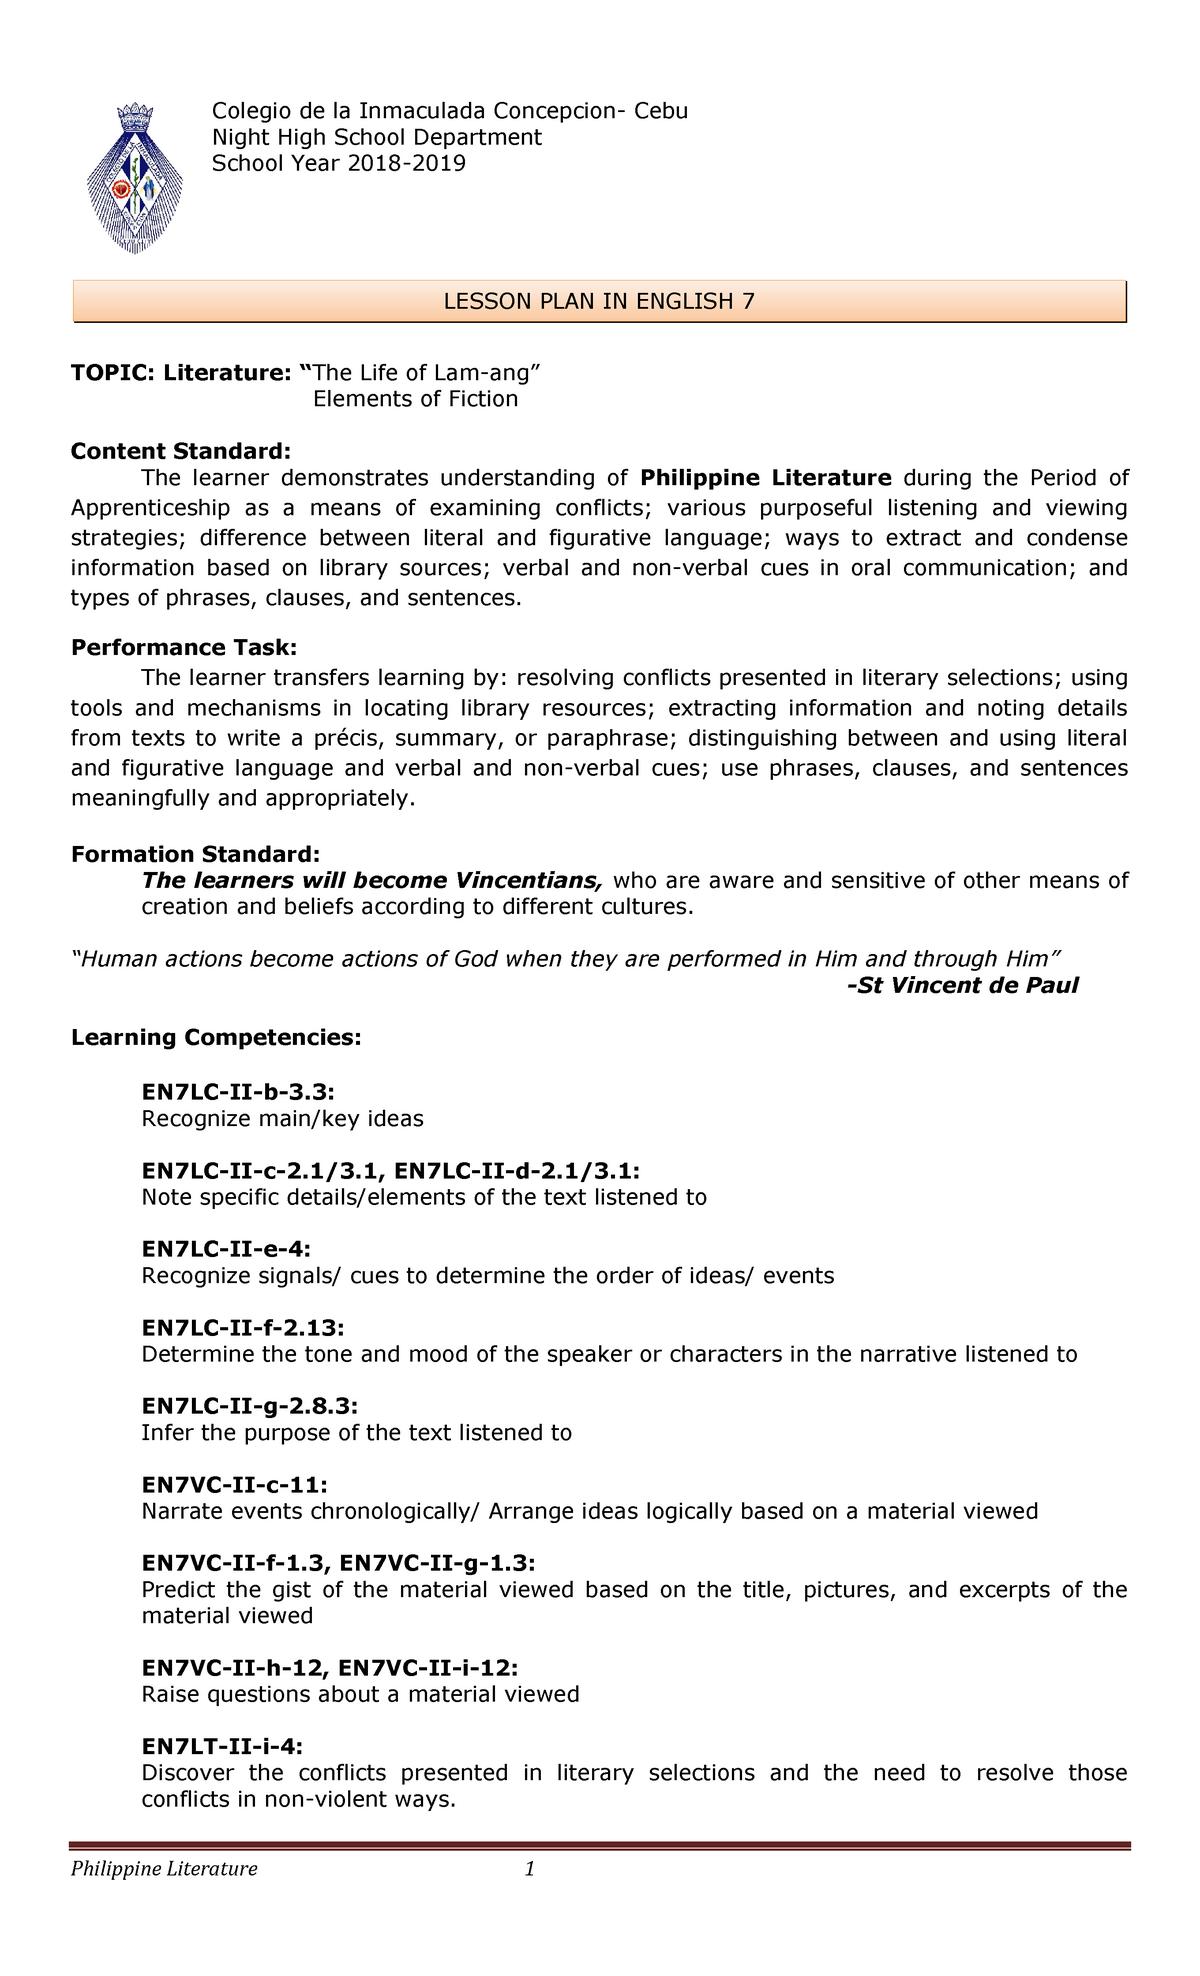 7-LP-1STWK - Grade 7 lesson plan - BSED - StuDocu